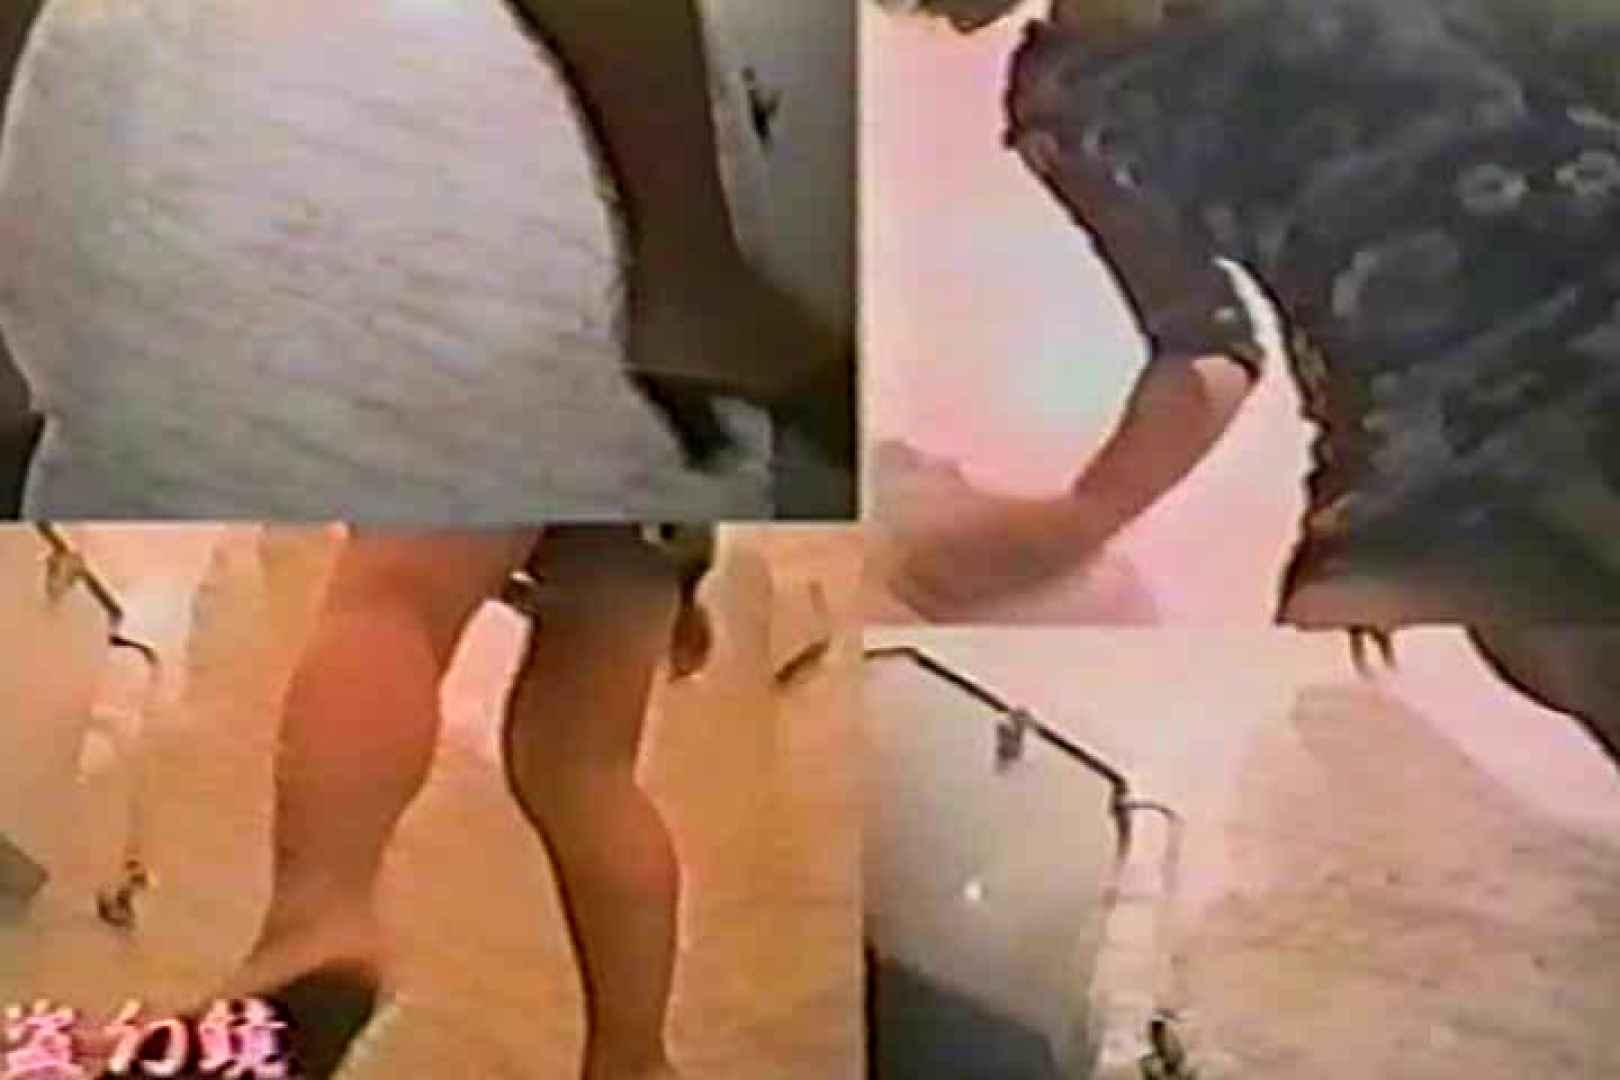 新説羞恥美女んMVX-1 覗き | 洗面所突入  99pic 43